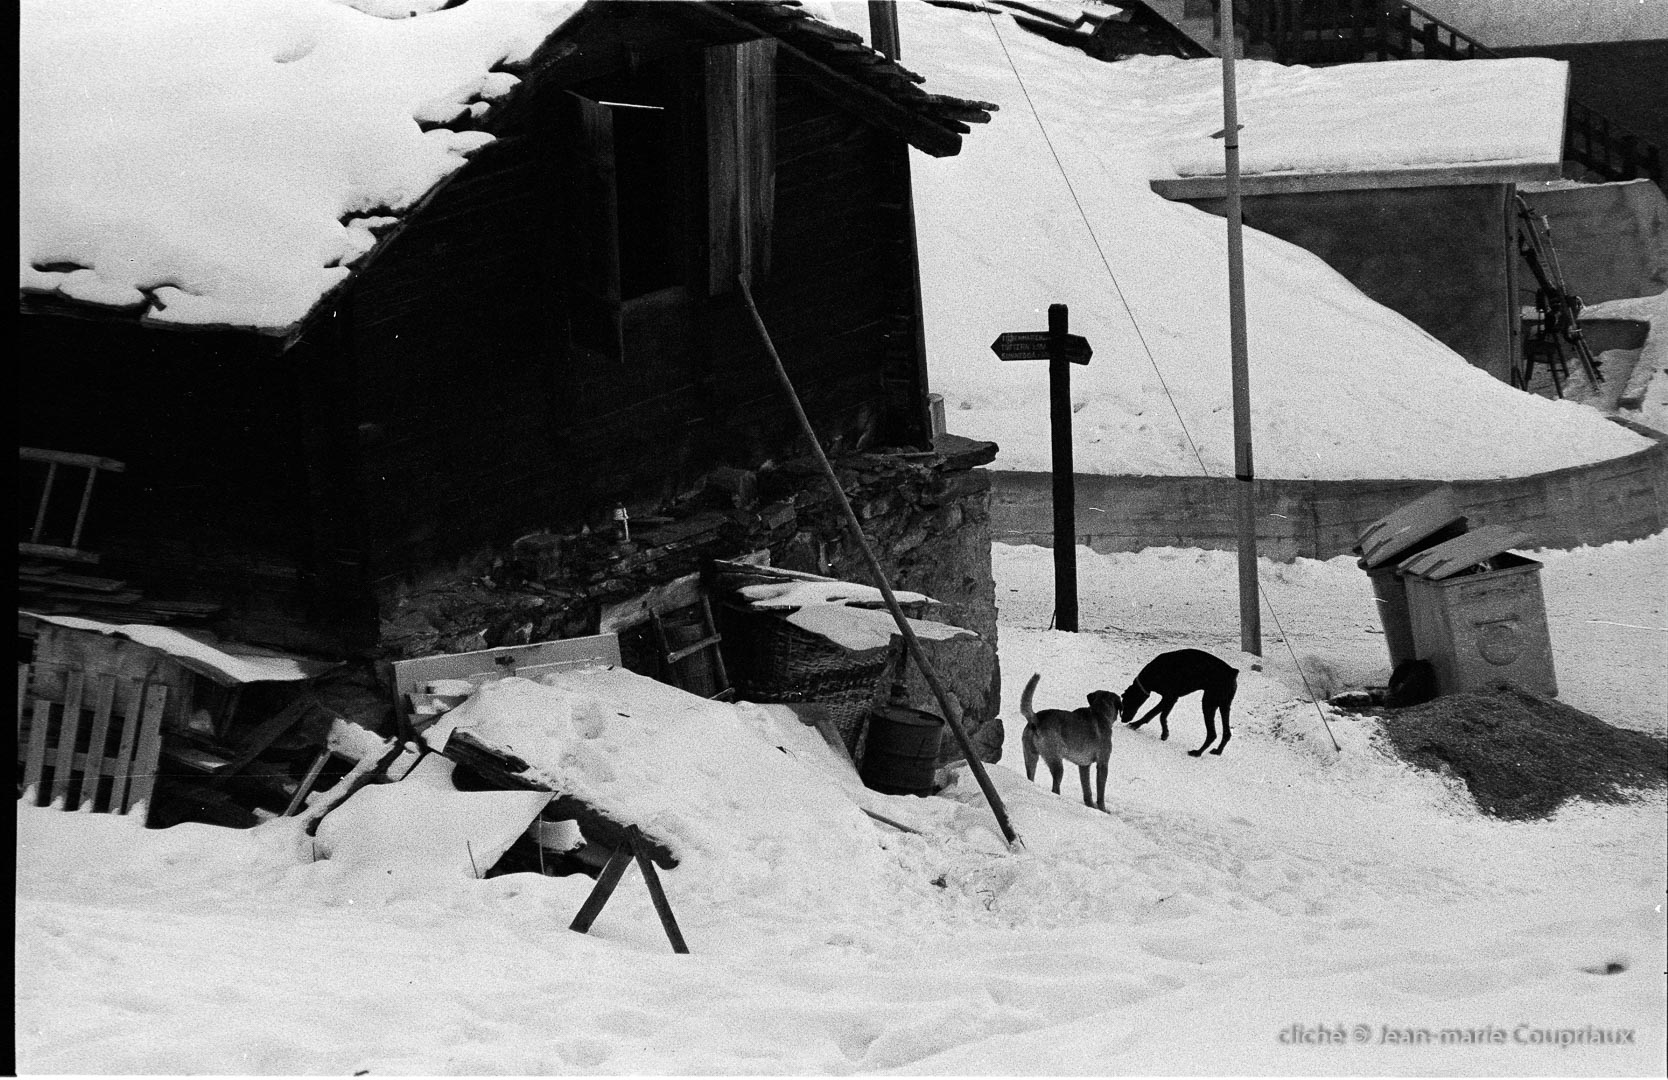 1978_Zermatt-nb-11.jpg